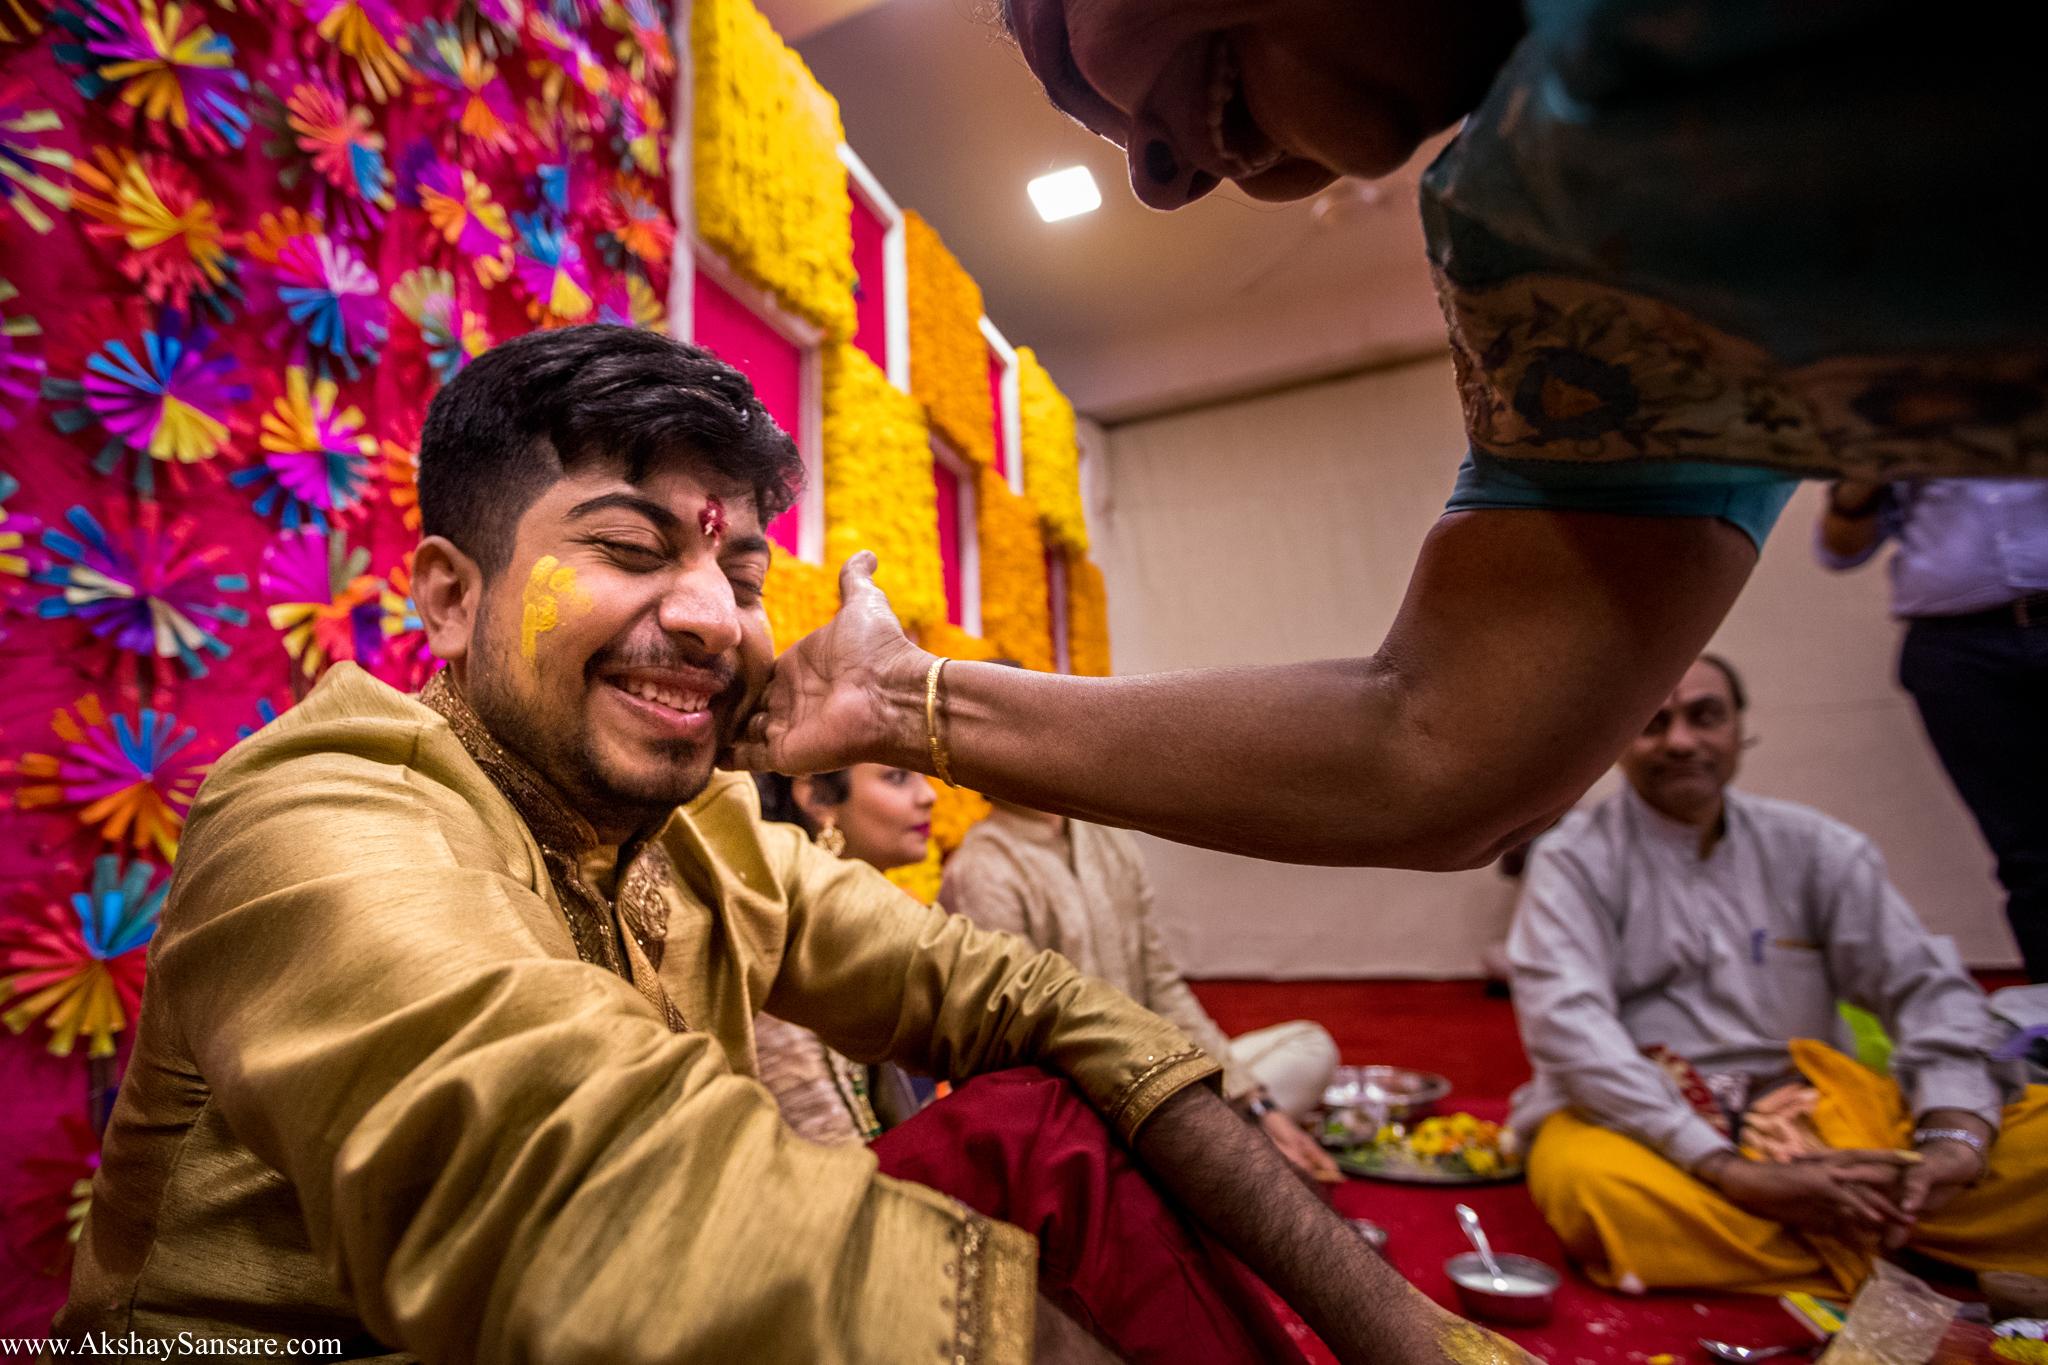 Nupur & Rohan wedding Akshay Sansare Photography best wedding photographer in mumbai India Candid(24).jpg